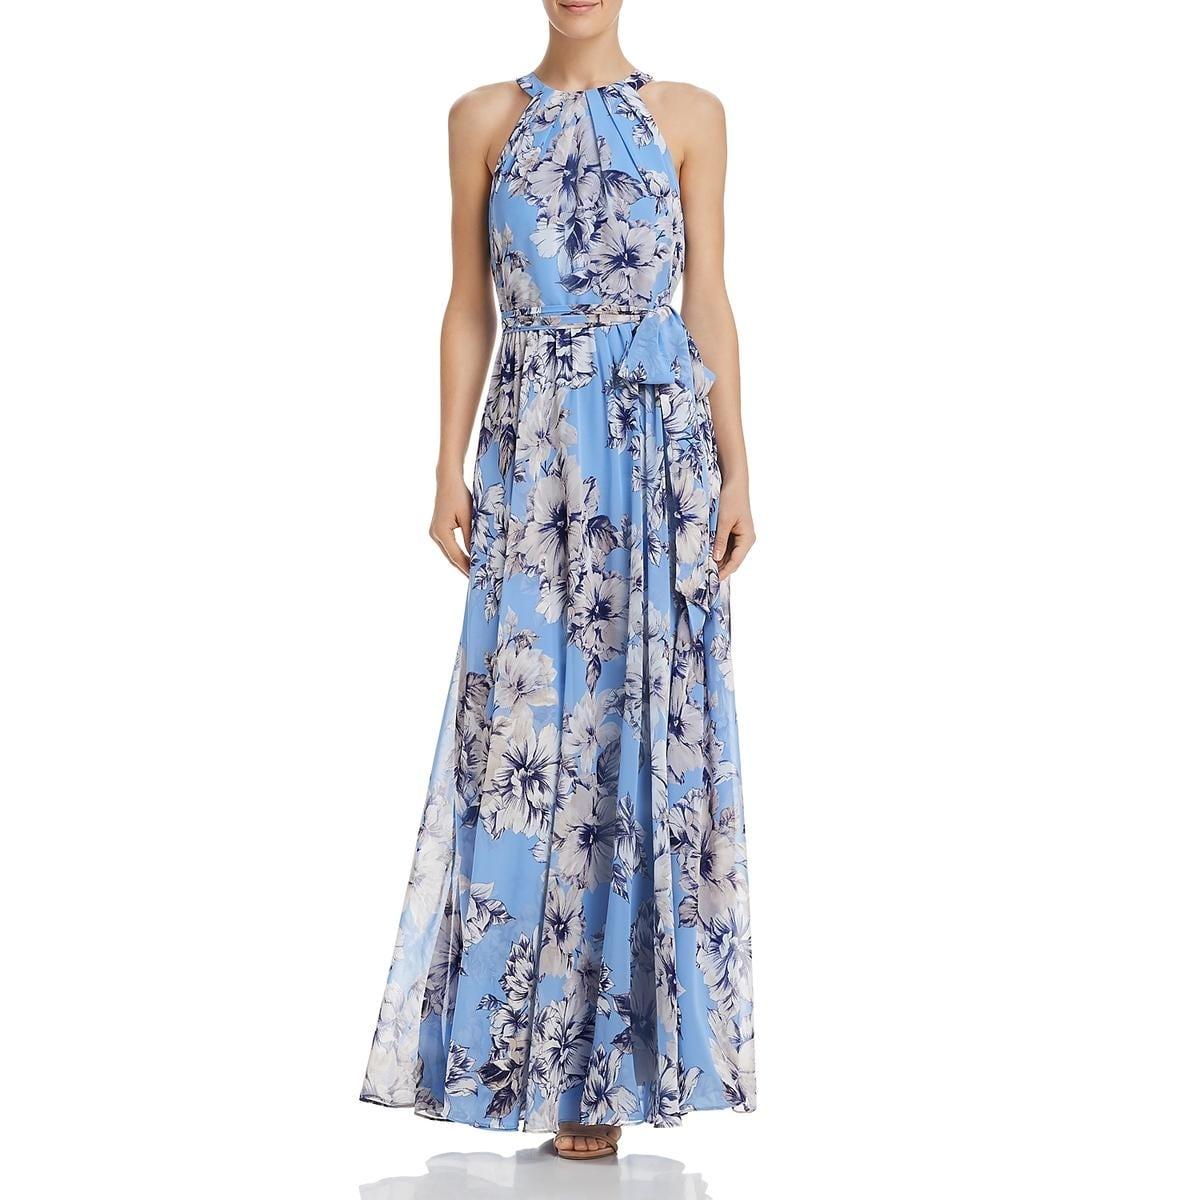 0eaf3b56e8 Shop Eliza J Womens Maxi Dress Floral Print Halter - Free Shipping ...